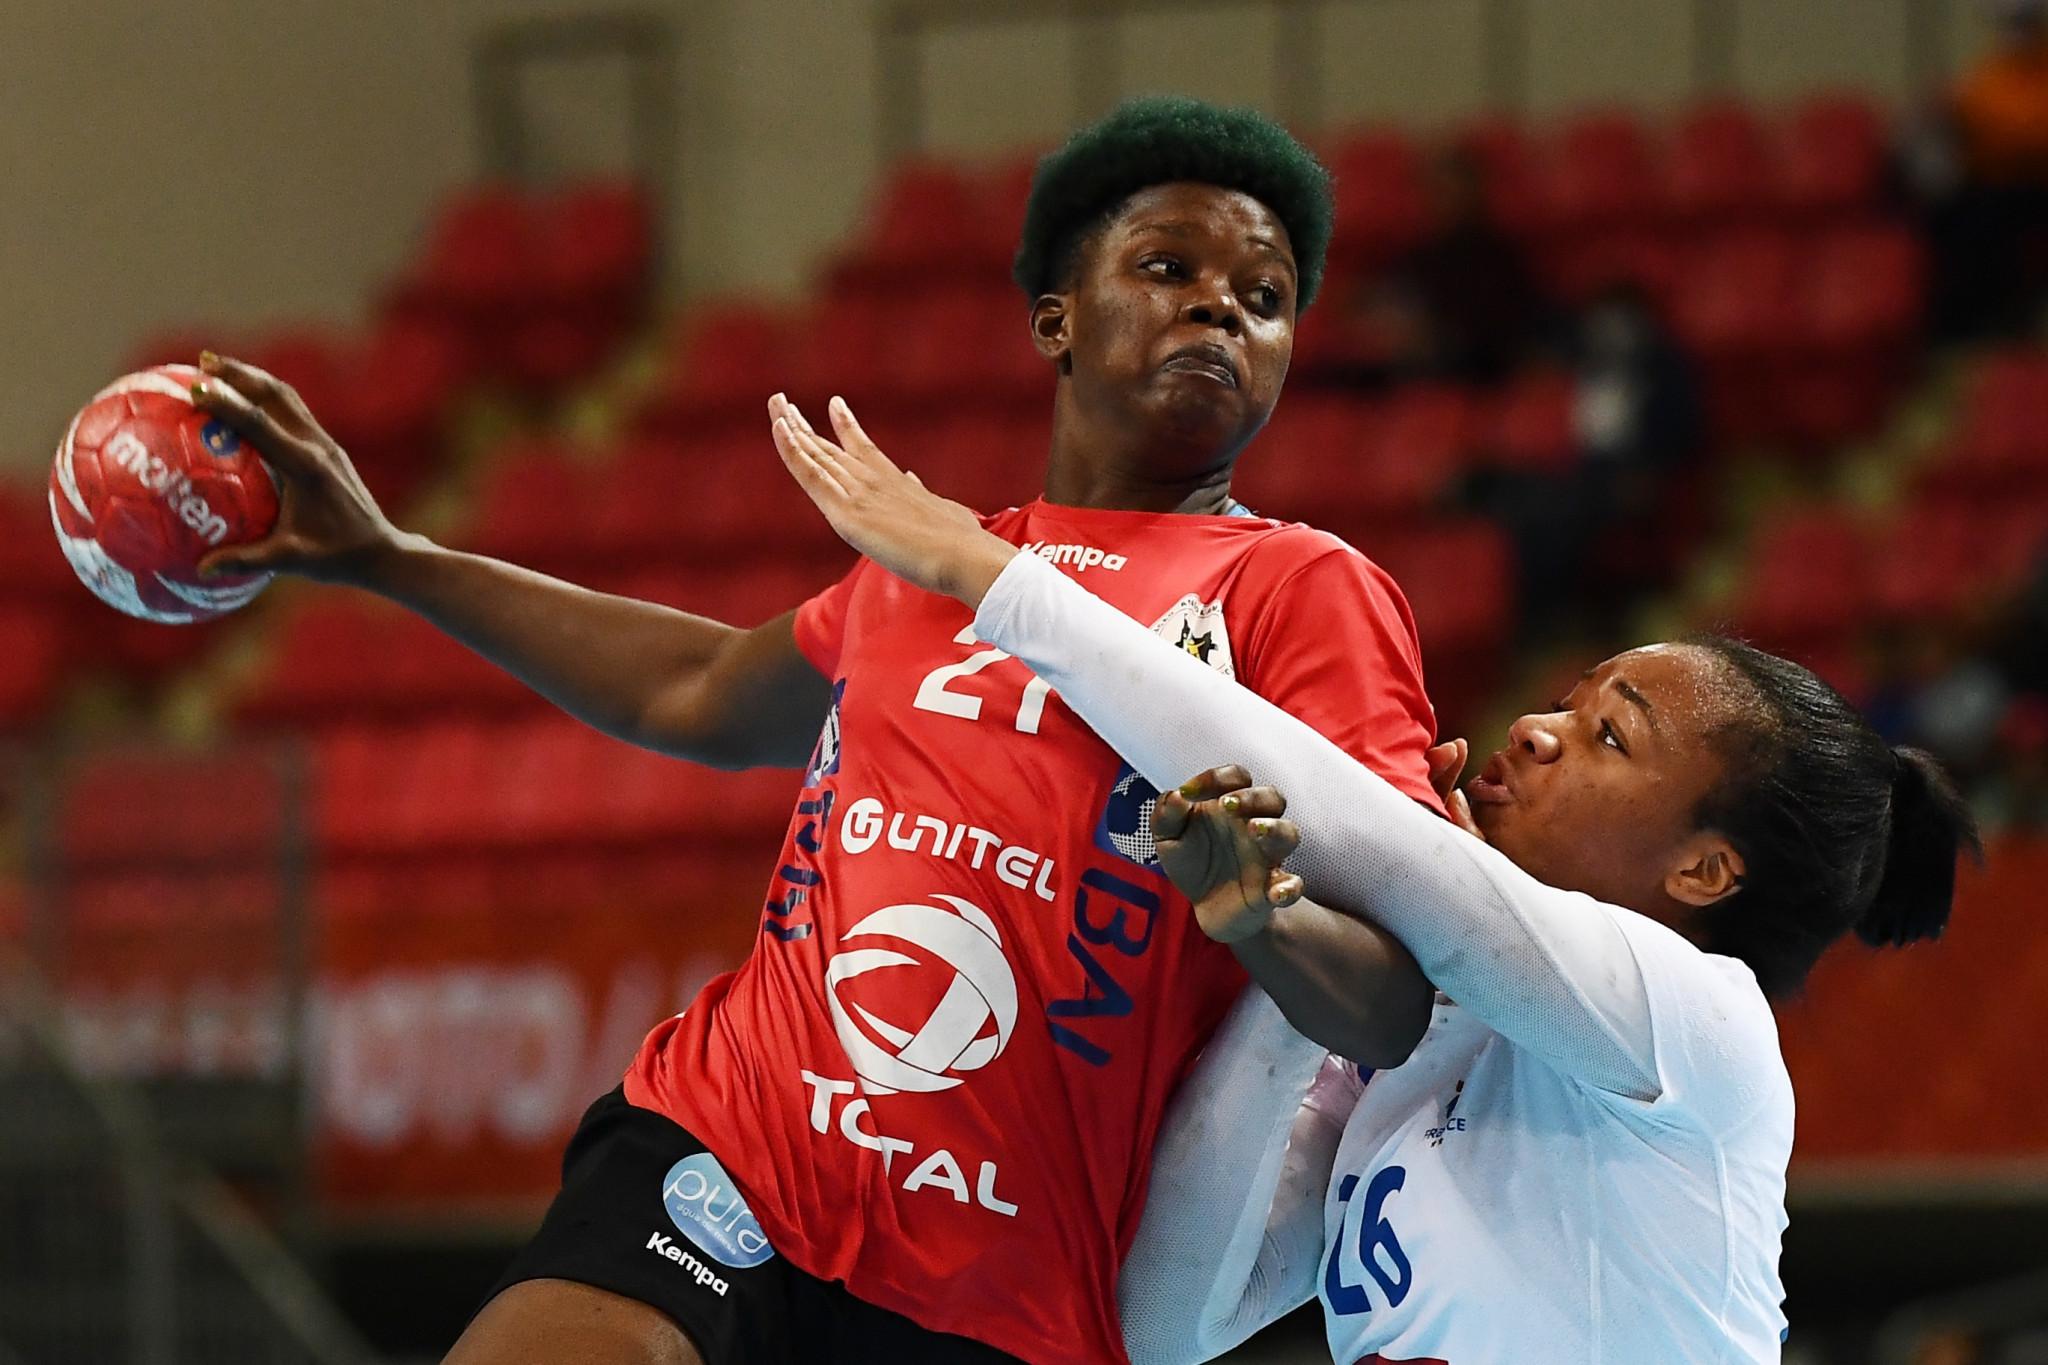 Holders Angola advance at African Women's Handball Championship